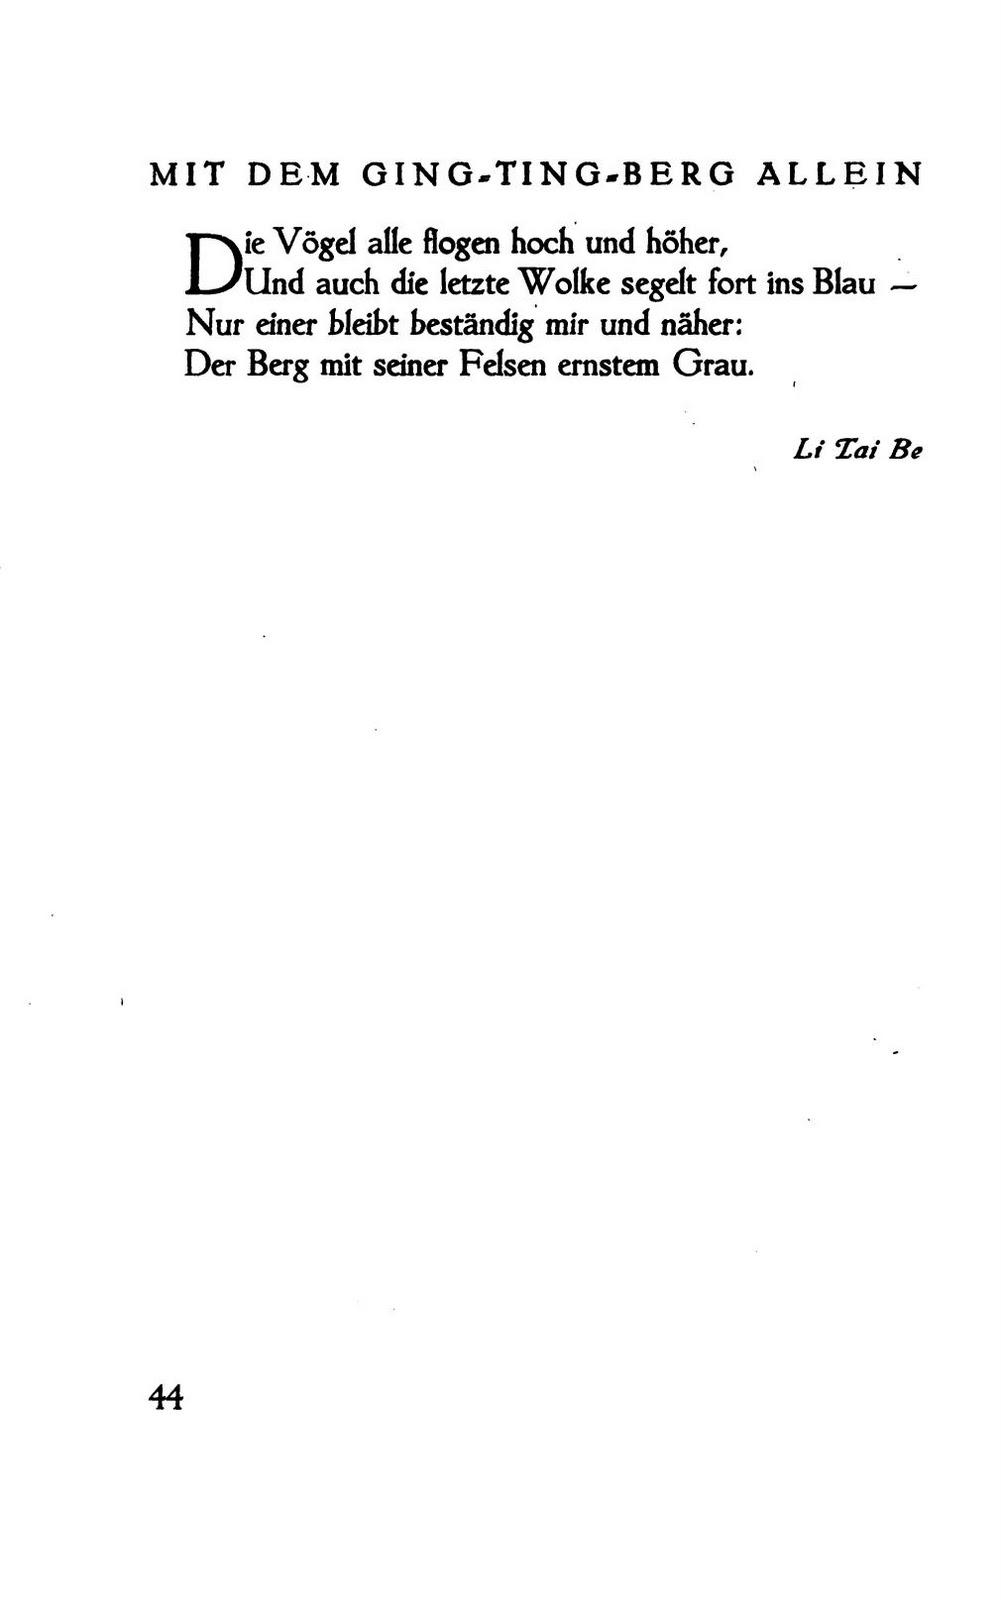 Epoesie Februar 2011